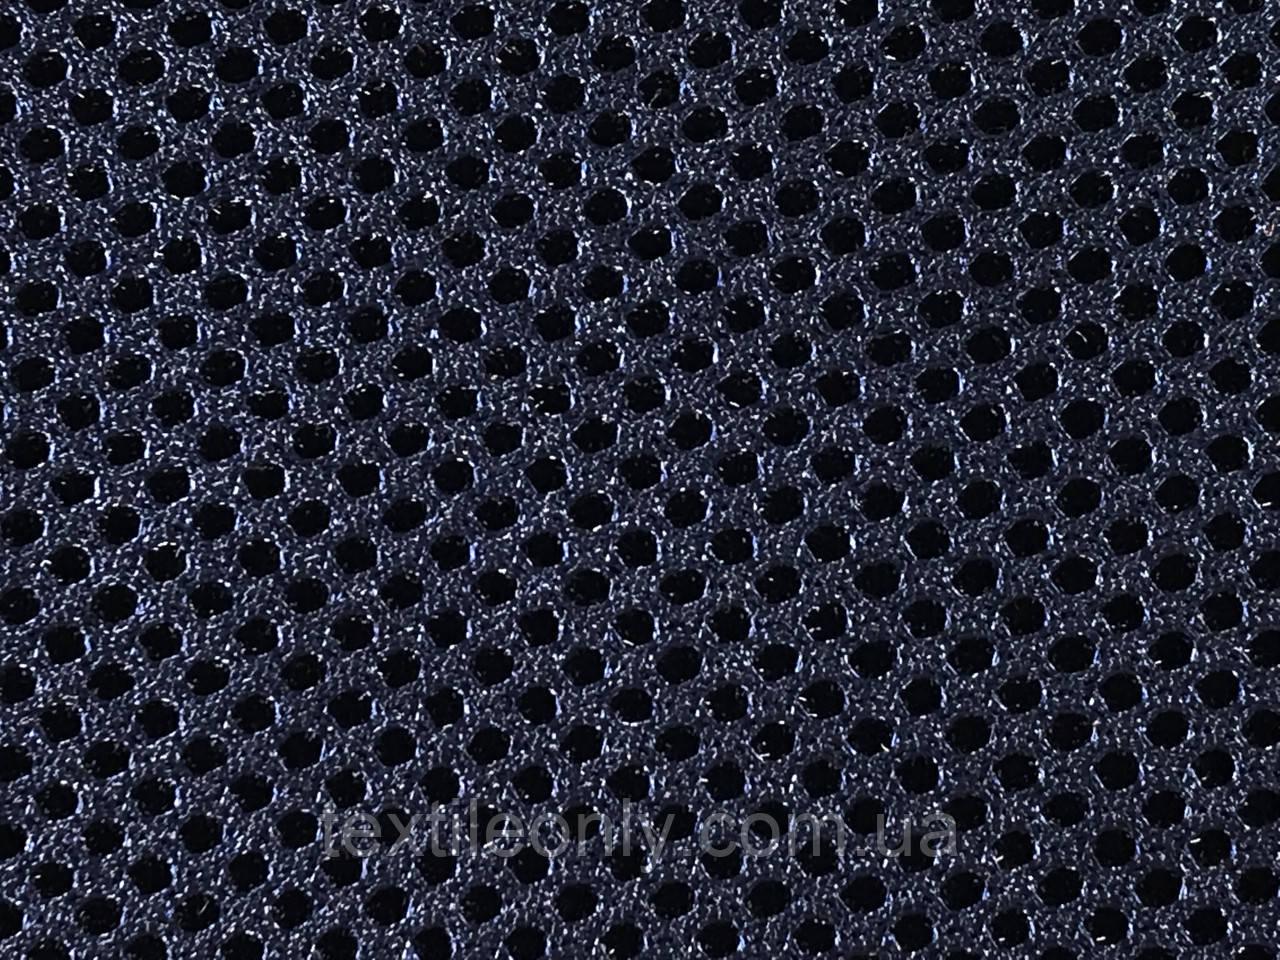 Сетка сумочно-обувная на поролоне артекс (airtex) цвет темно синий